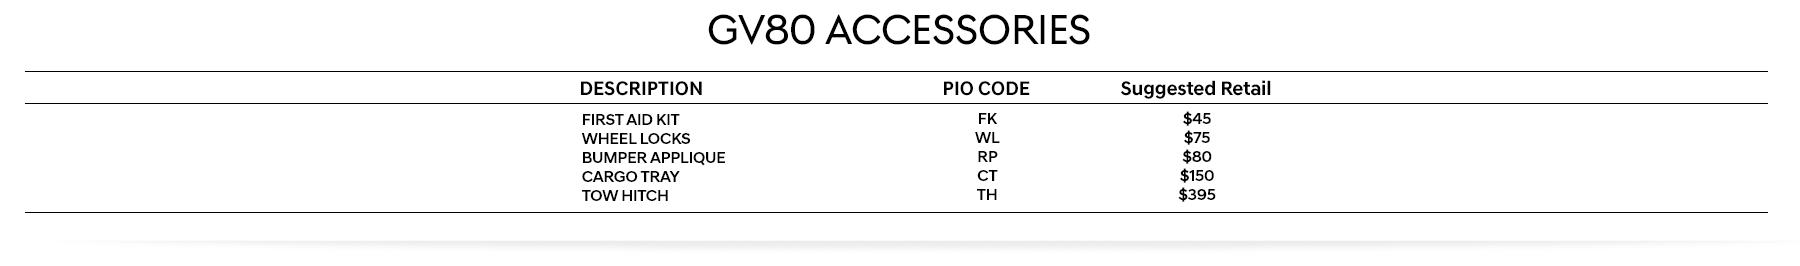 GV80-Accessories